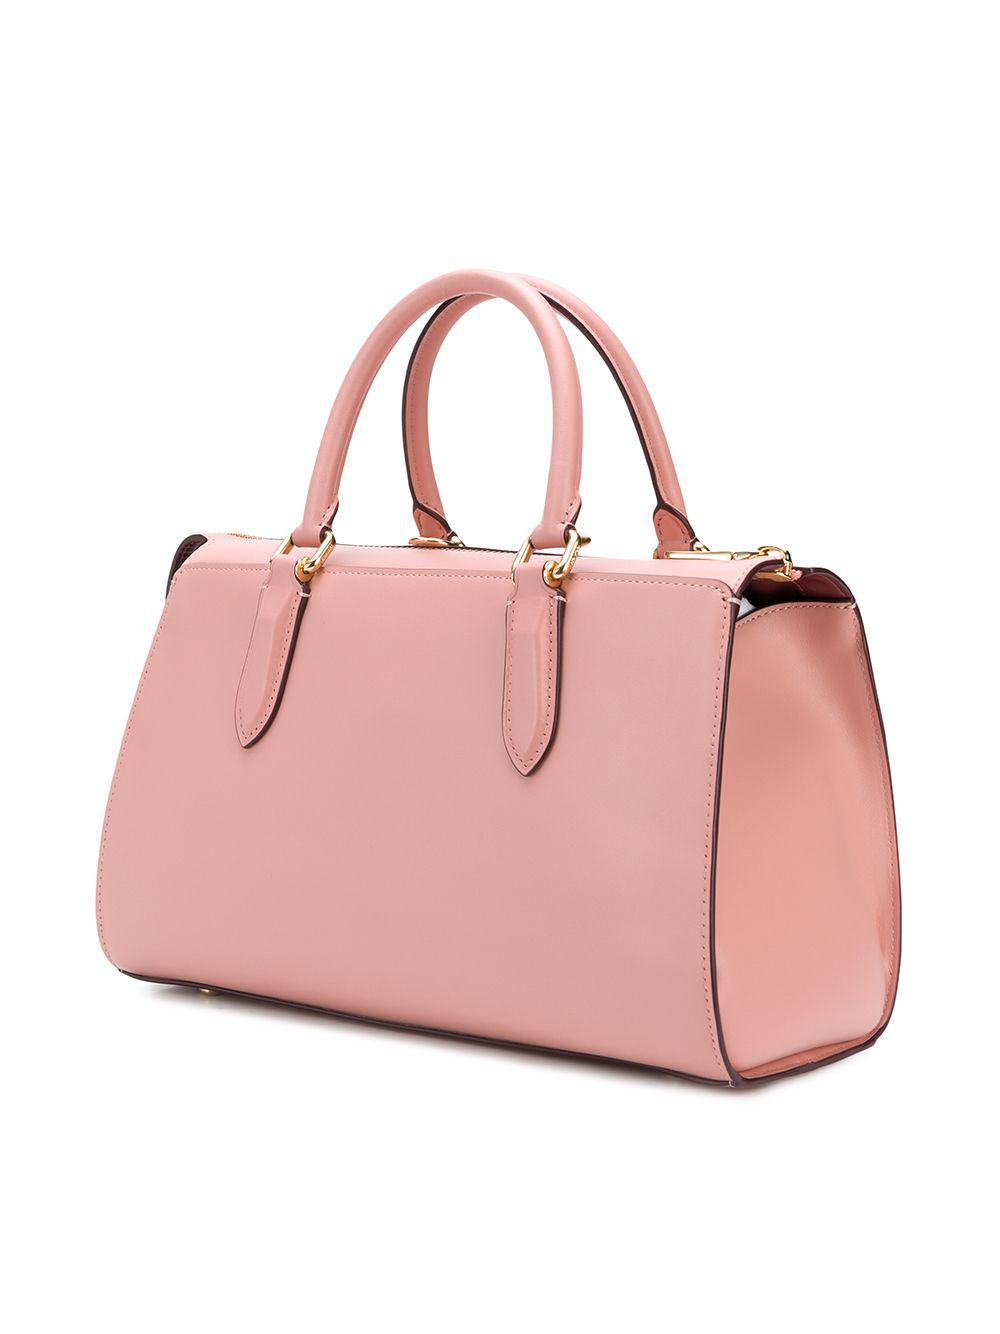 b6ec4656 COACH Pink X Selena Gomez Selena Bond Bag